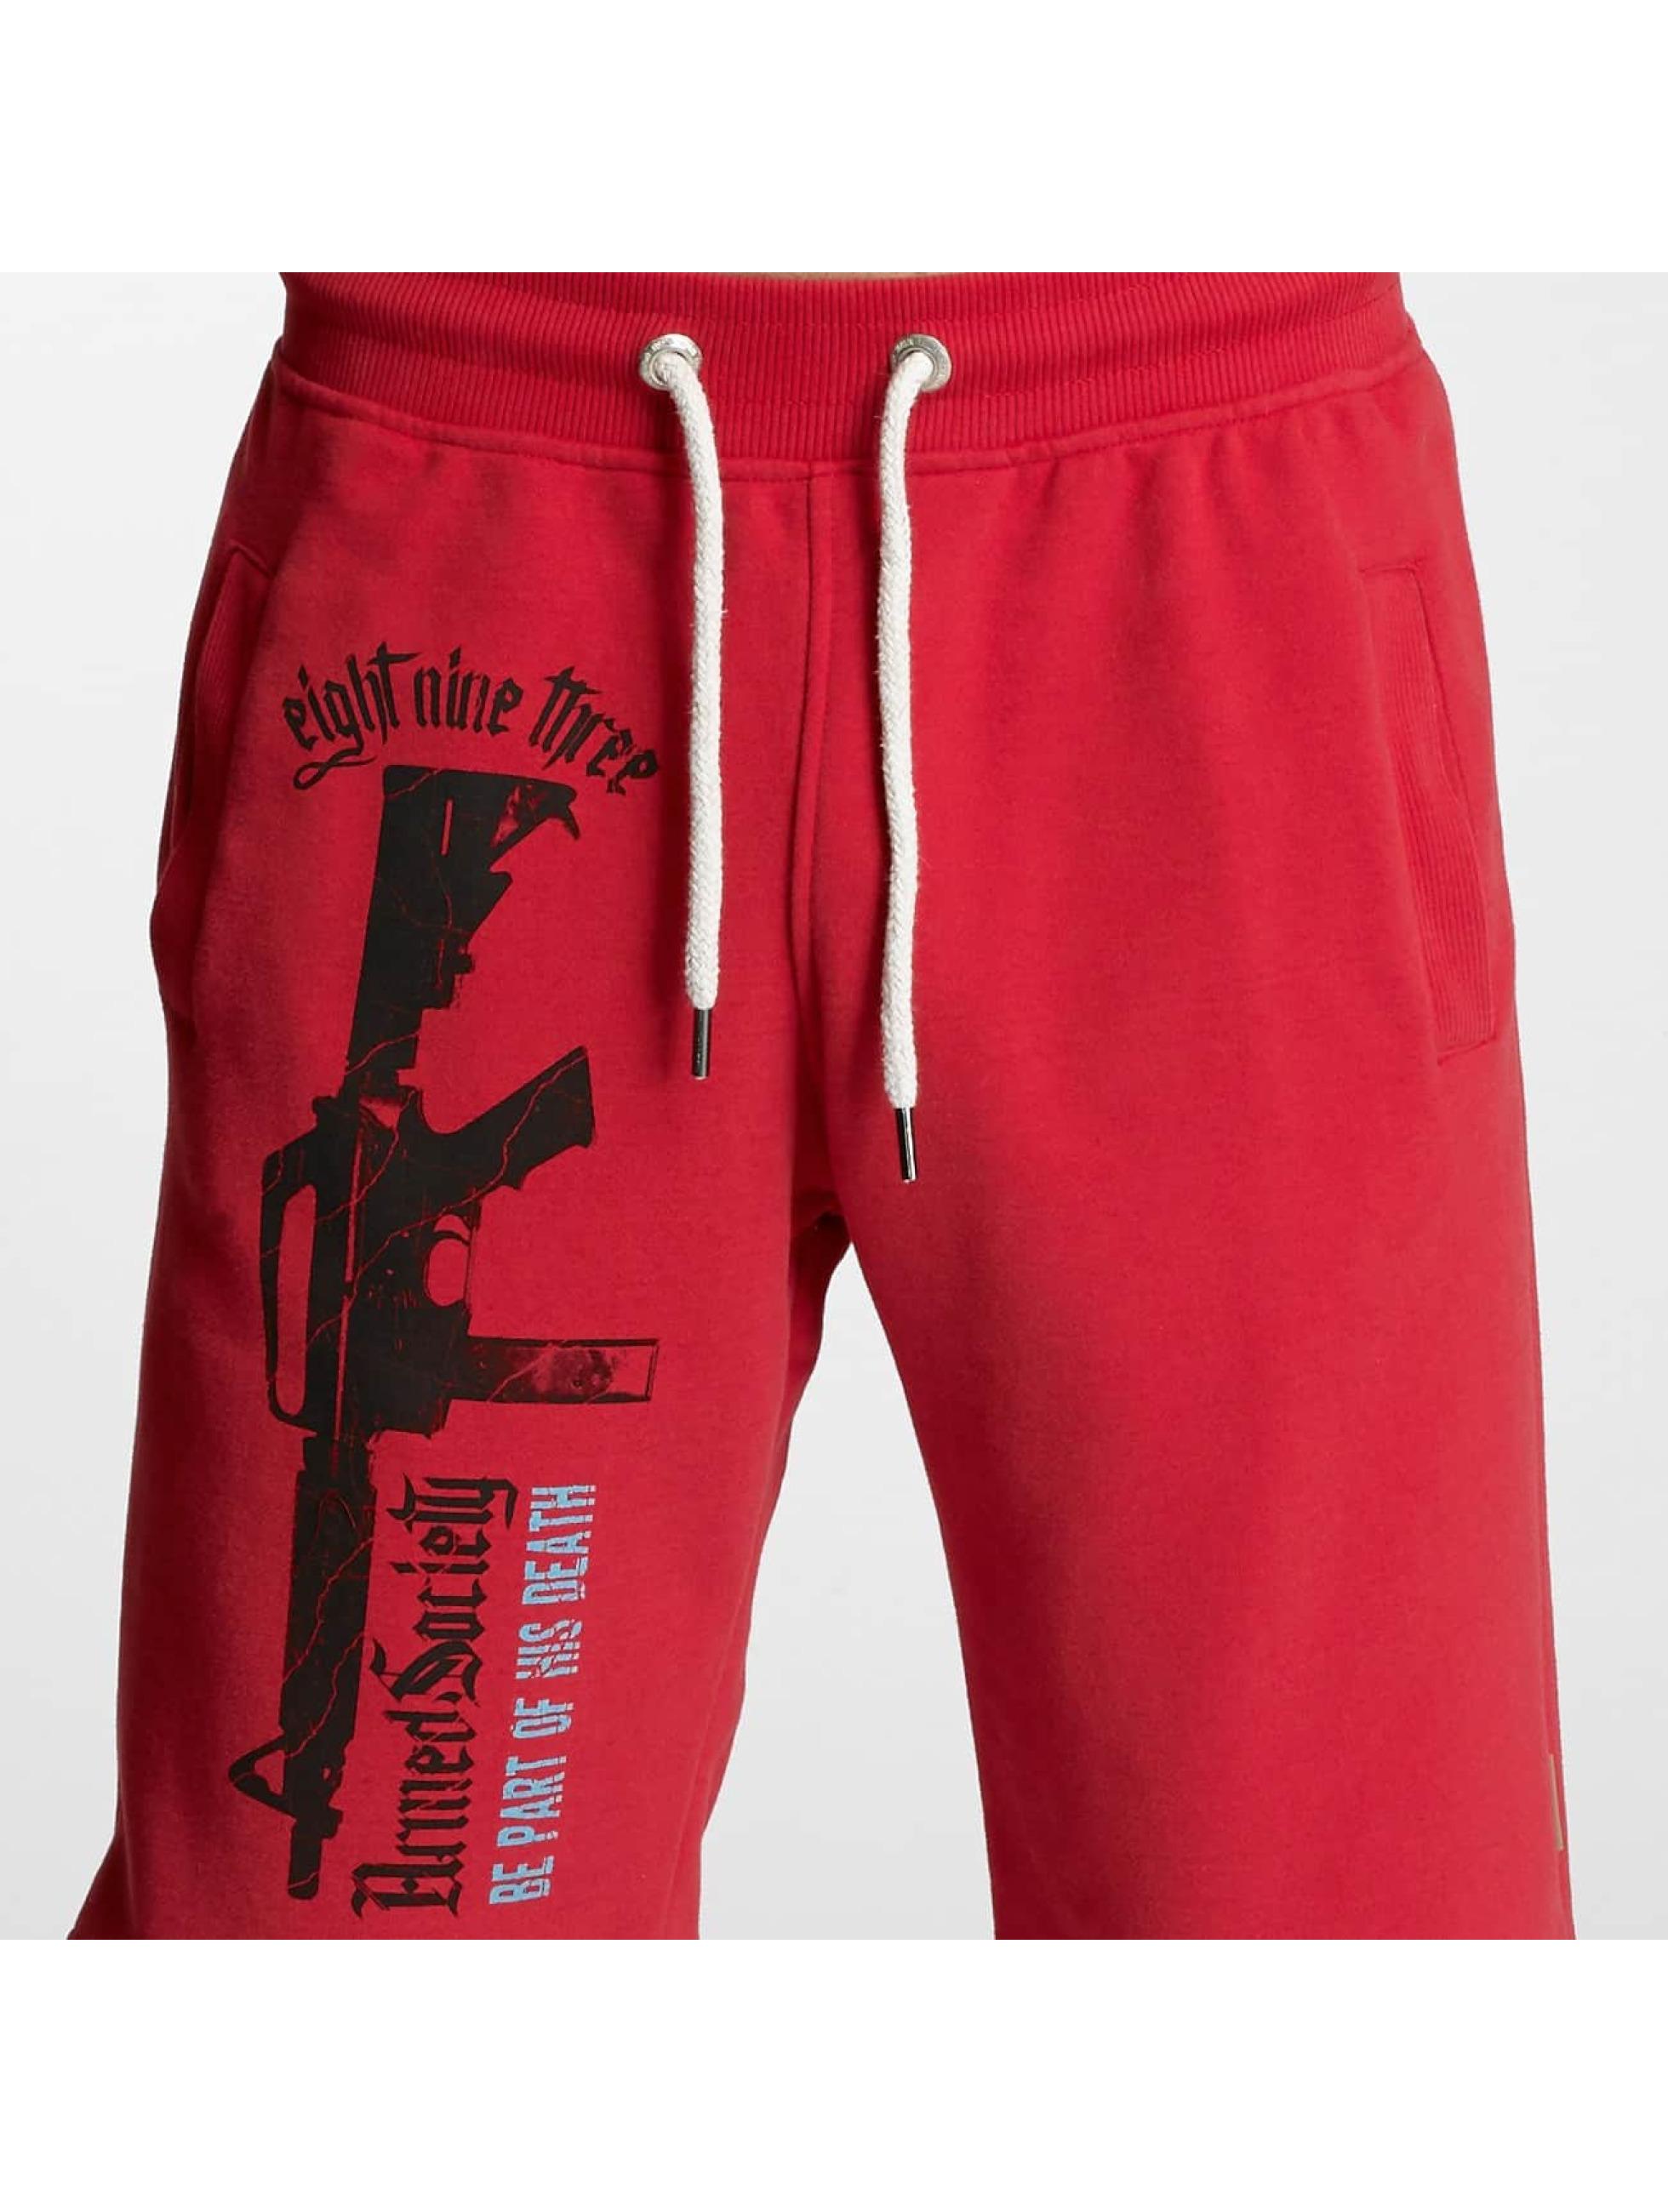 Yakuza Short Armed Society red